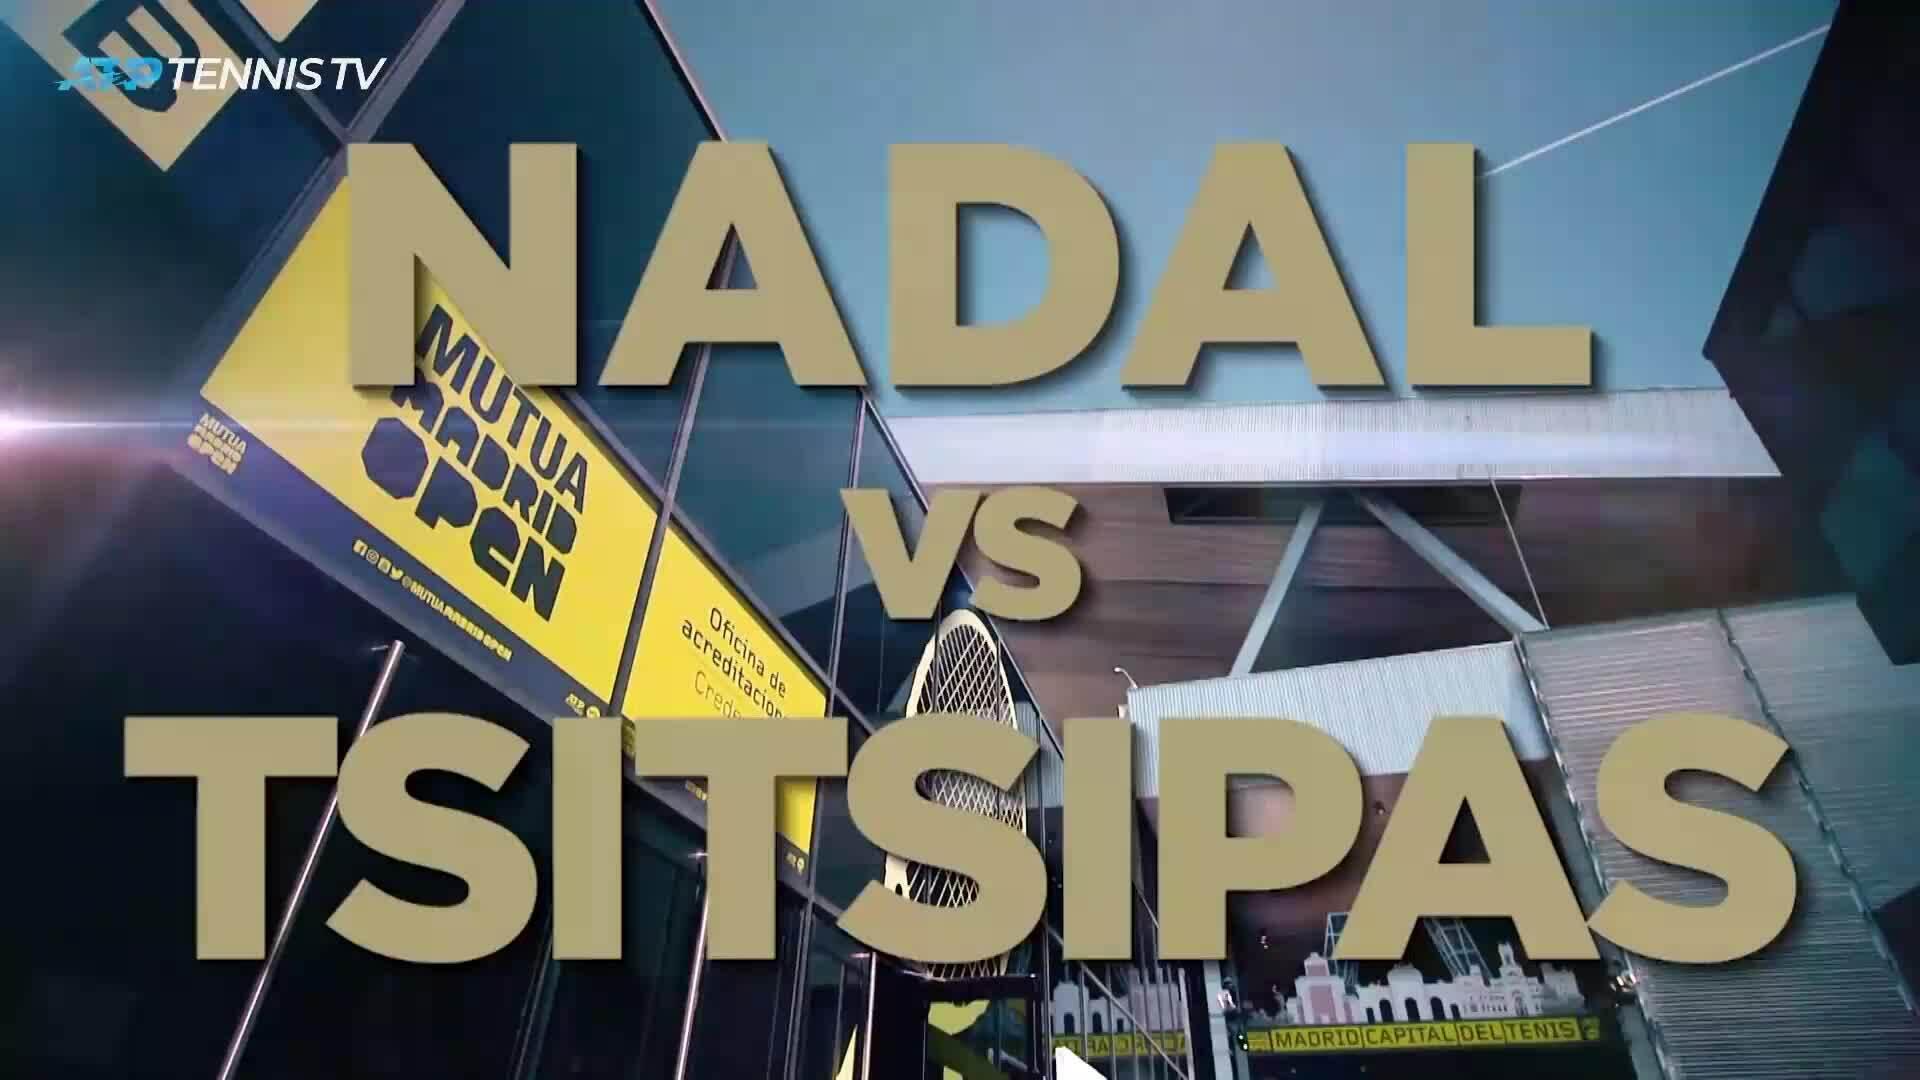 Stefanos Tsitsipas 2-1 Rafael Nadal